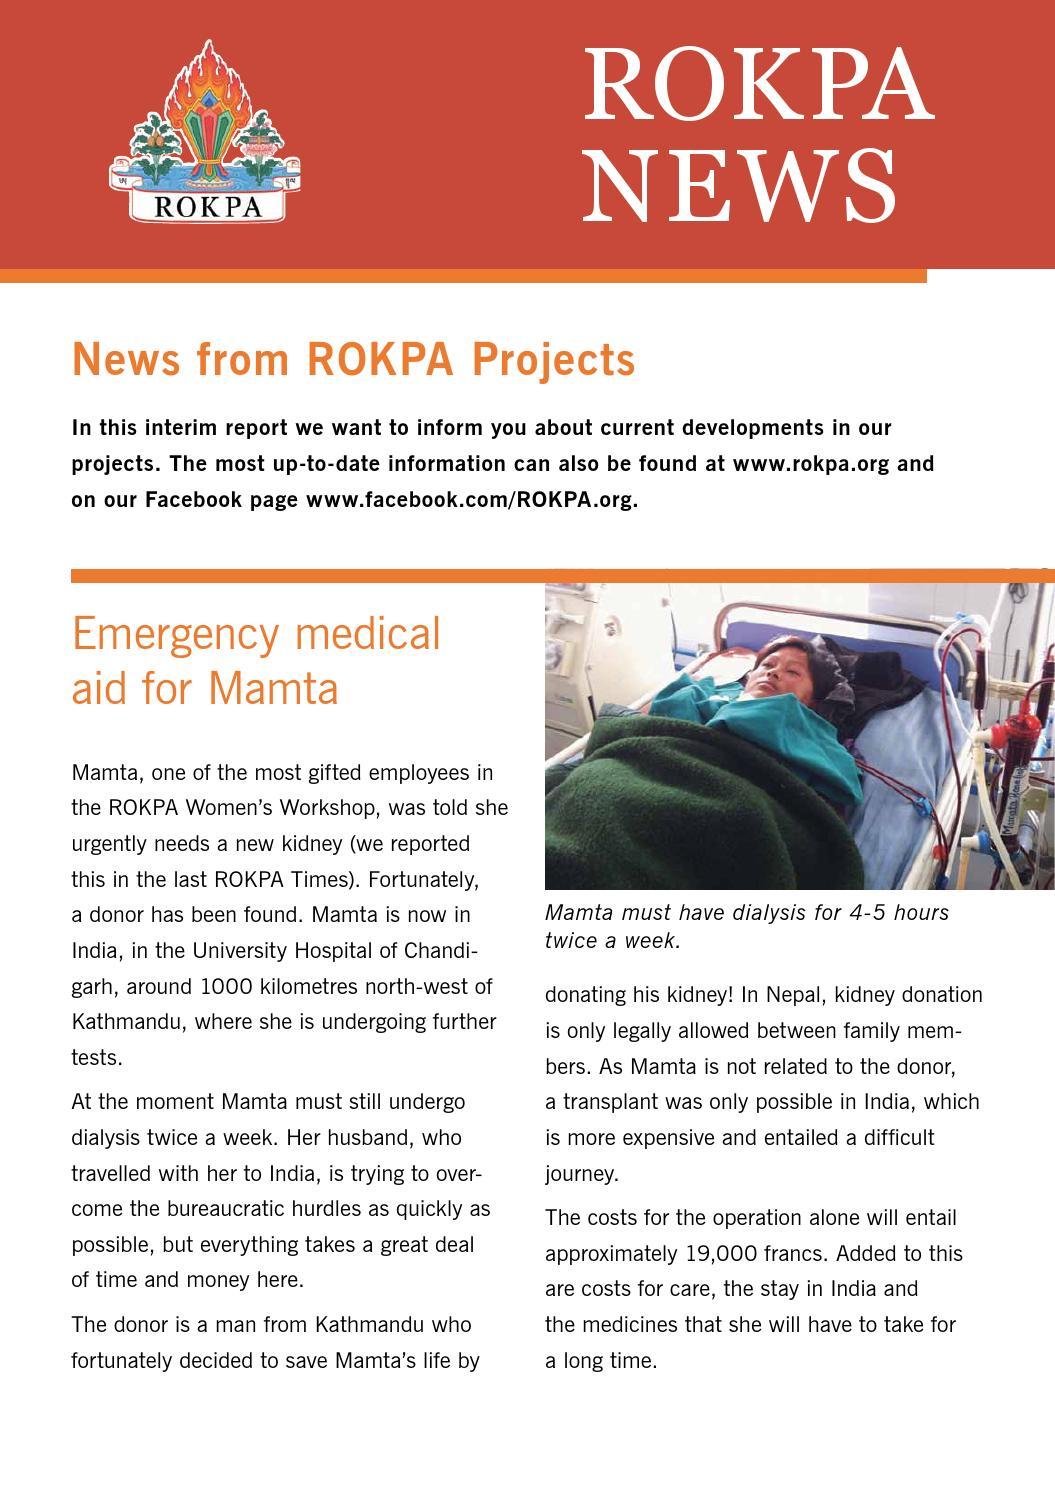 ROKPA Newsflyer June 2013 by ROKPA INTERNATIONAL - issuu